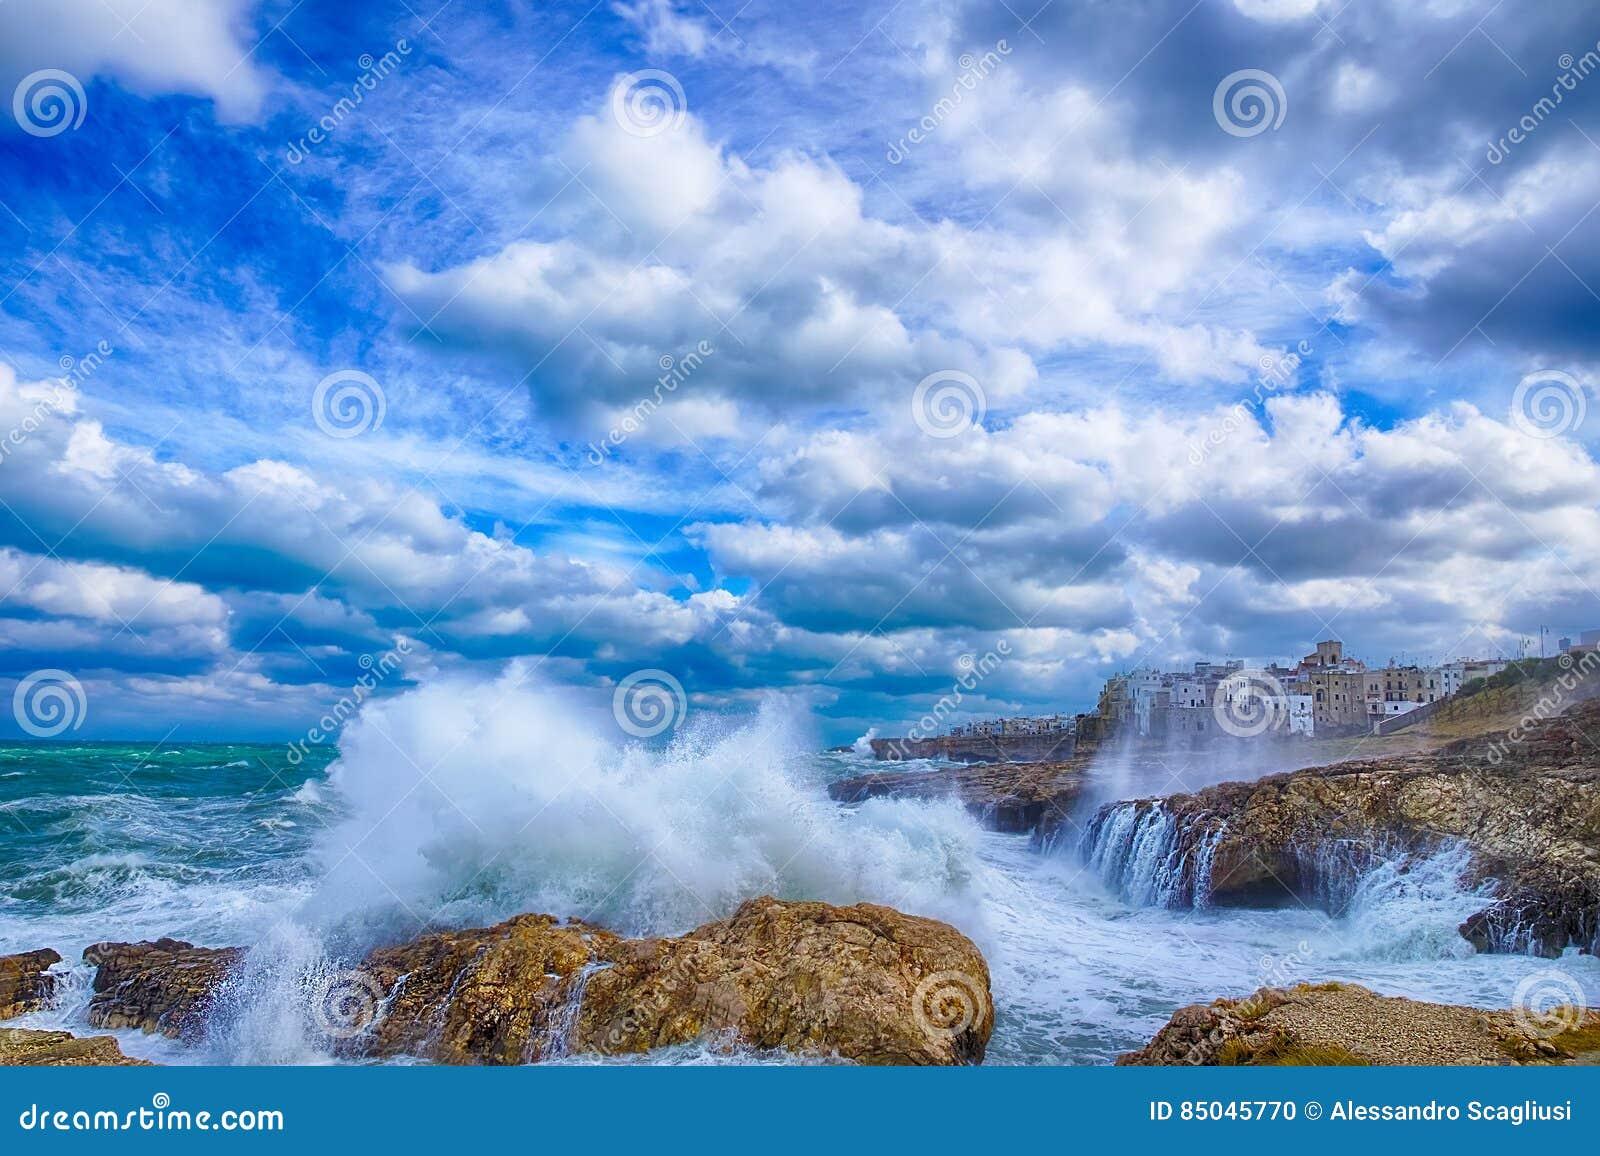 Polignano конематка шторм БАРИ, моря Италии: рай на земле